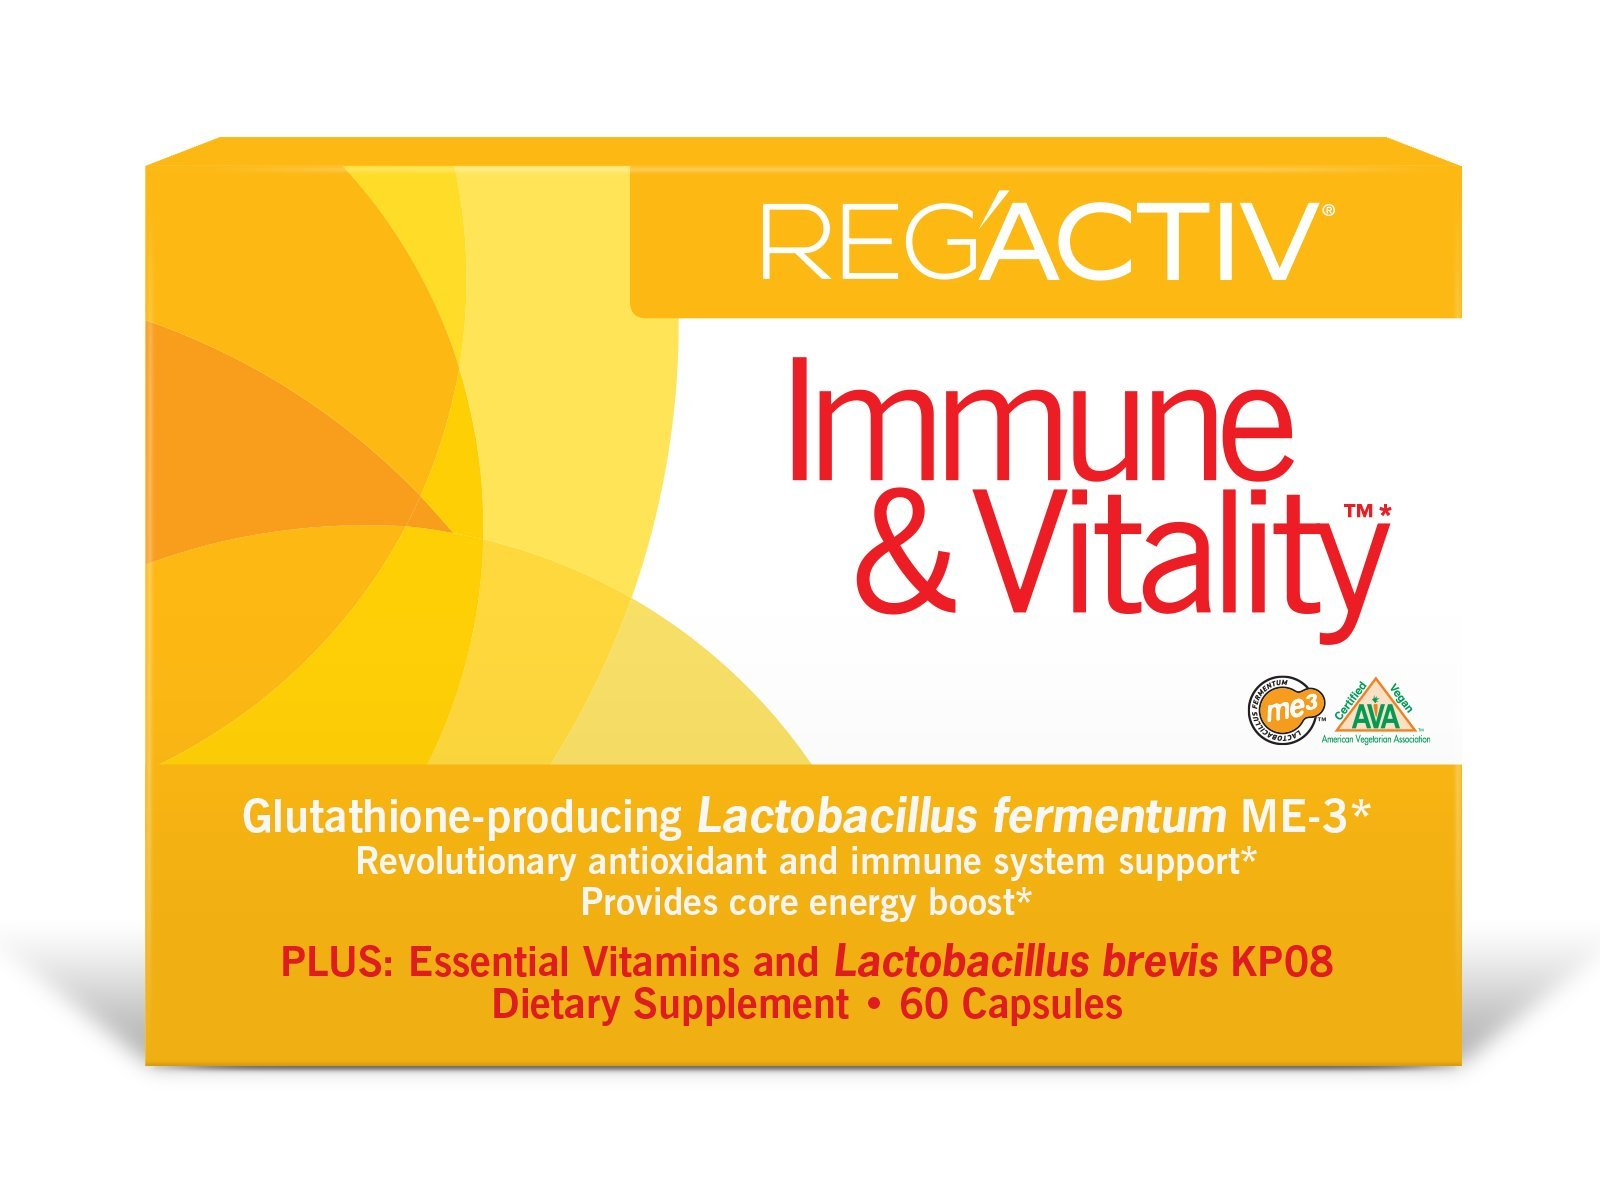 Reg'Activ Immune & Vitality with Lactobacillus fermentum ME-3, brevis KP08, L-Carnatine tartrate